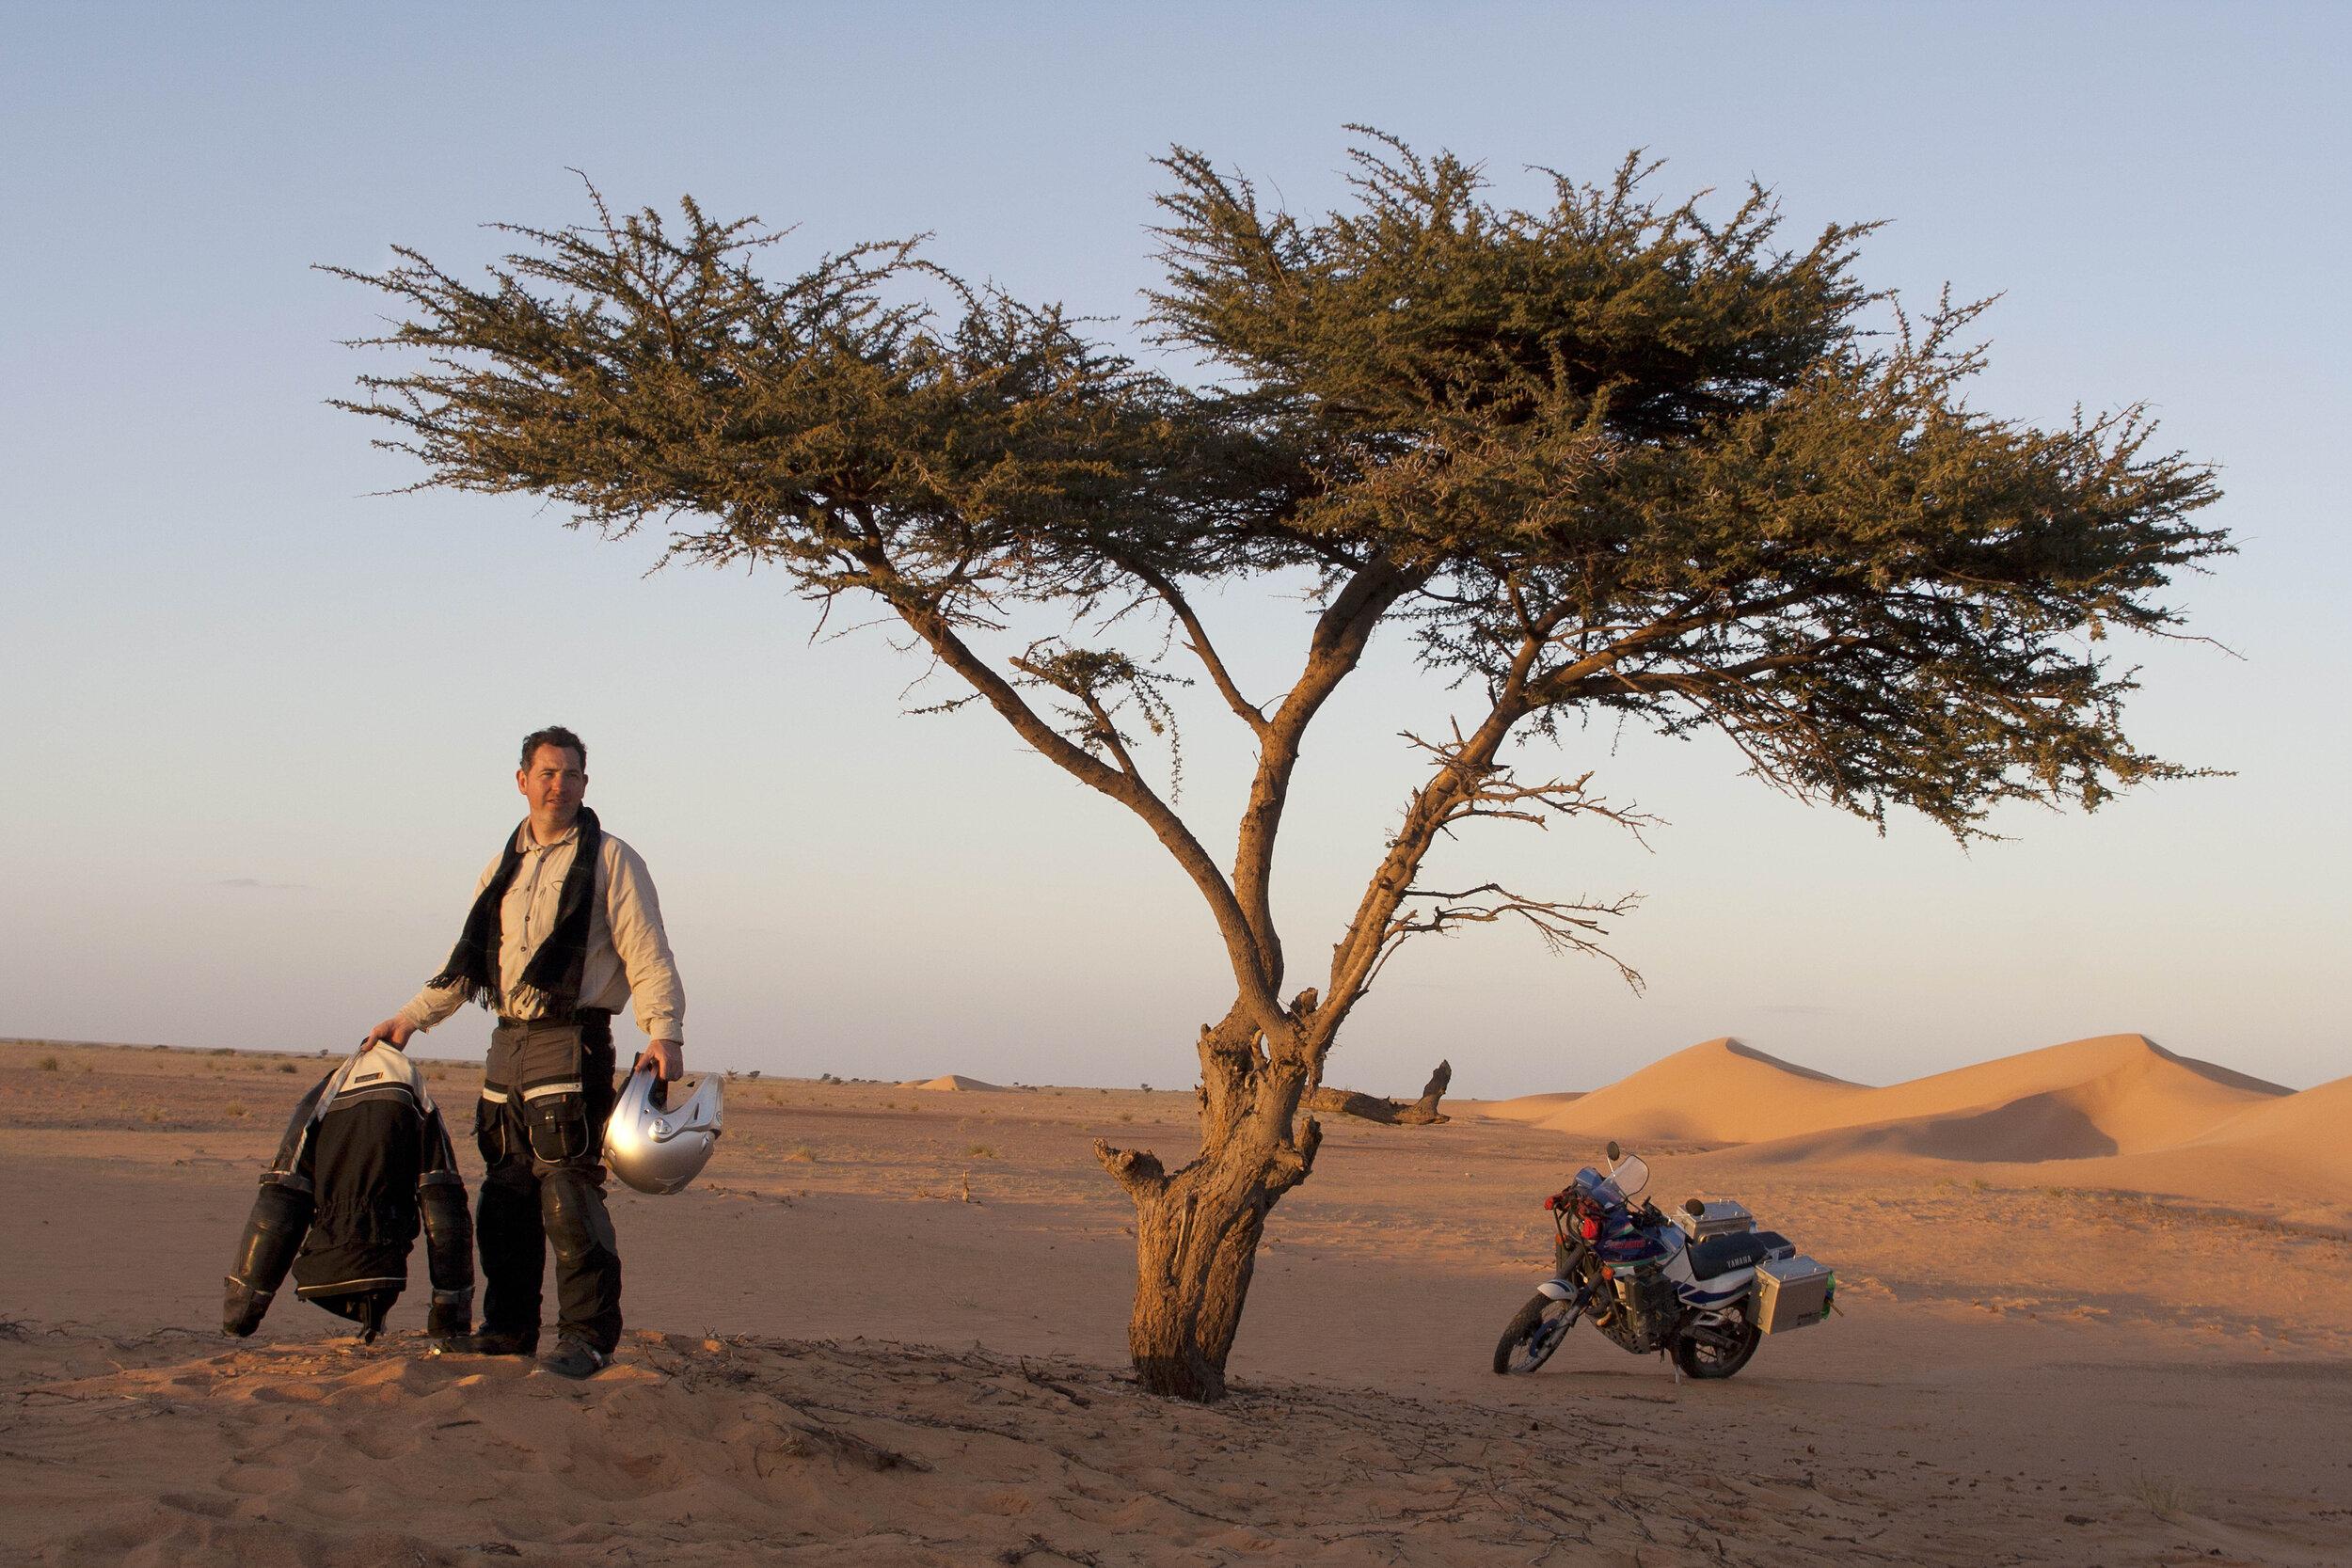 Sahara_Desert_Africa_Maurice-McDonald- Adventure-Rider-Radio-Motorcycle-Podcast.JPG